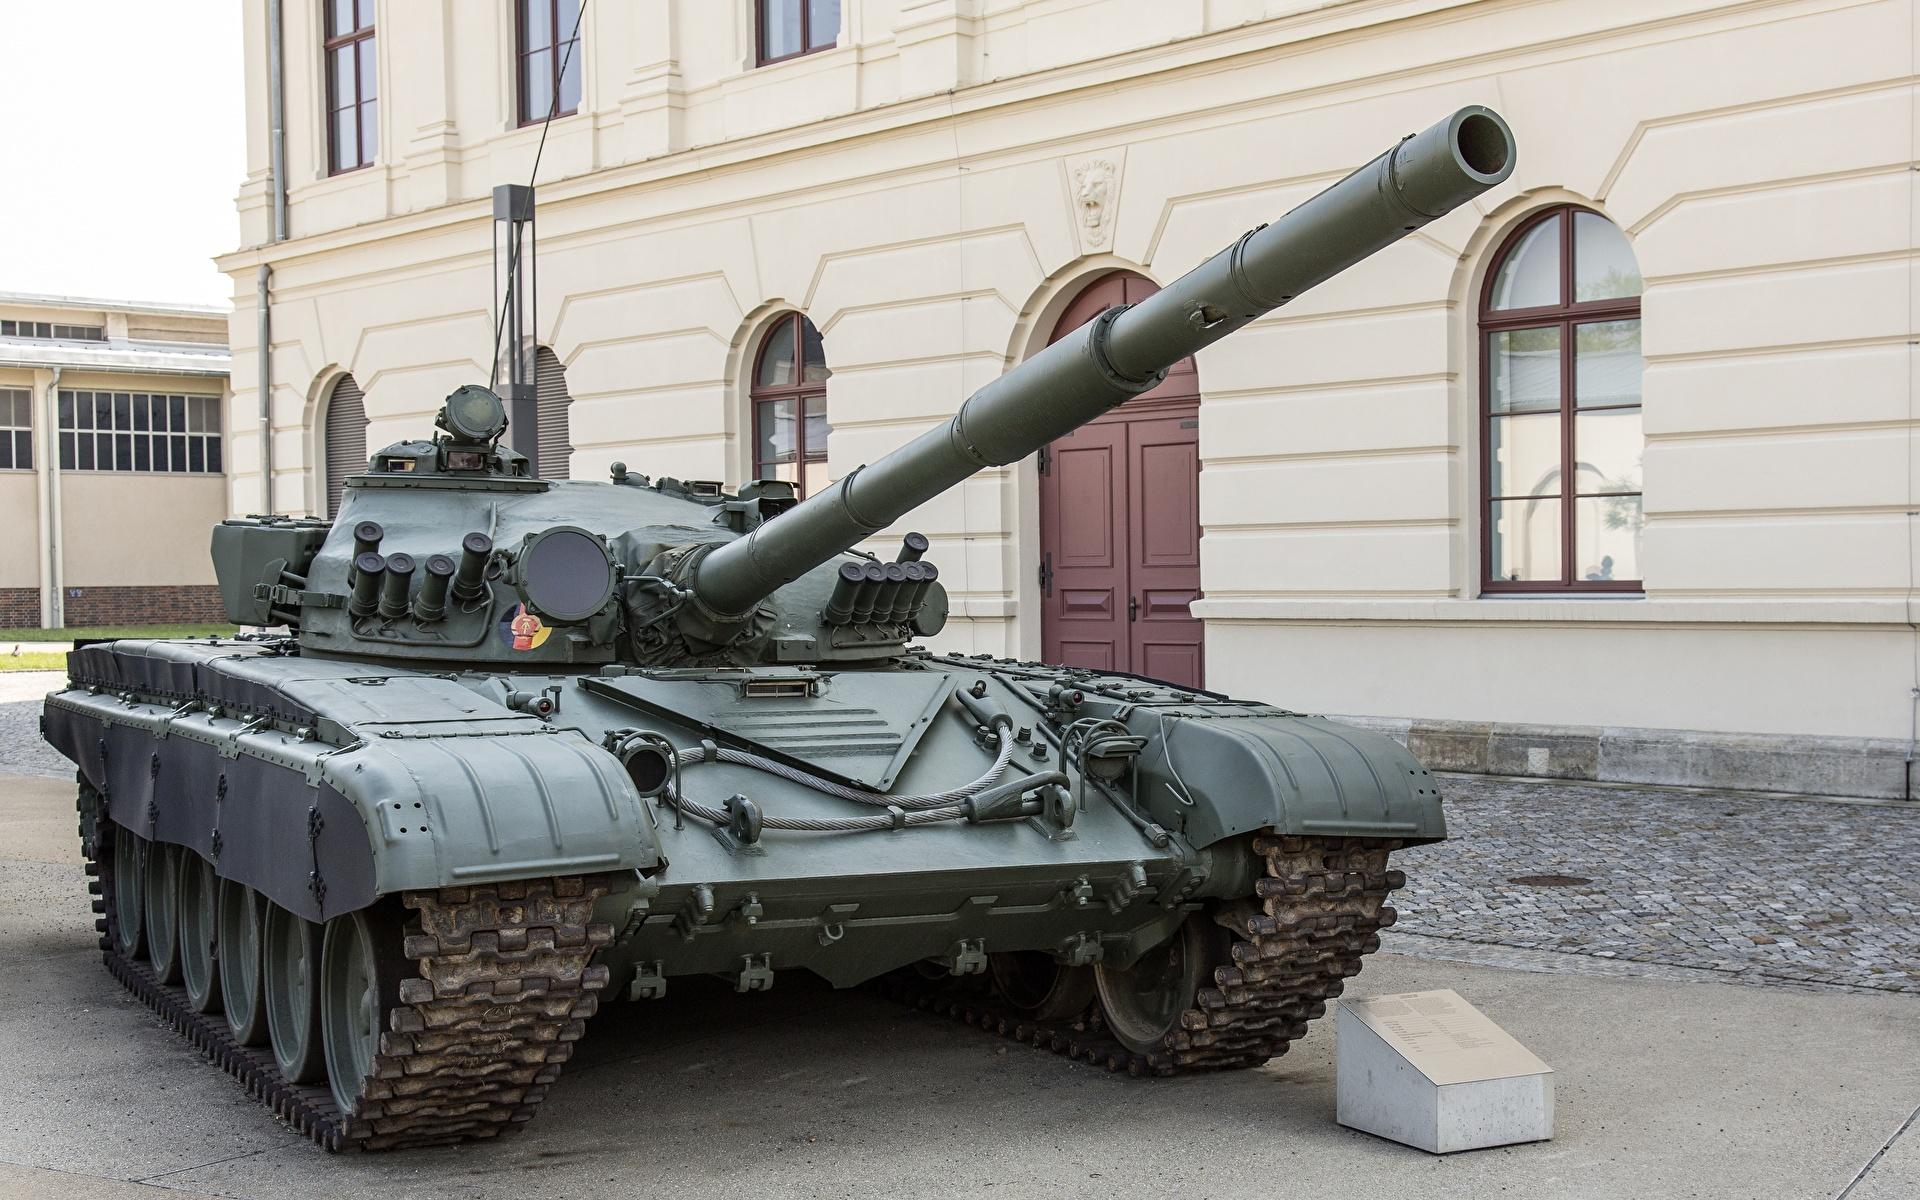 Bilder T-72 Panzer Russische M Heer 1920x1200